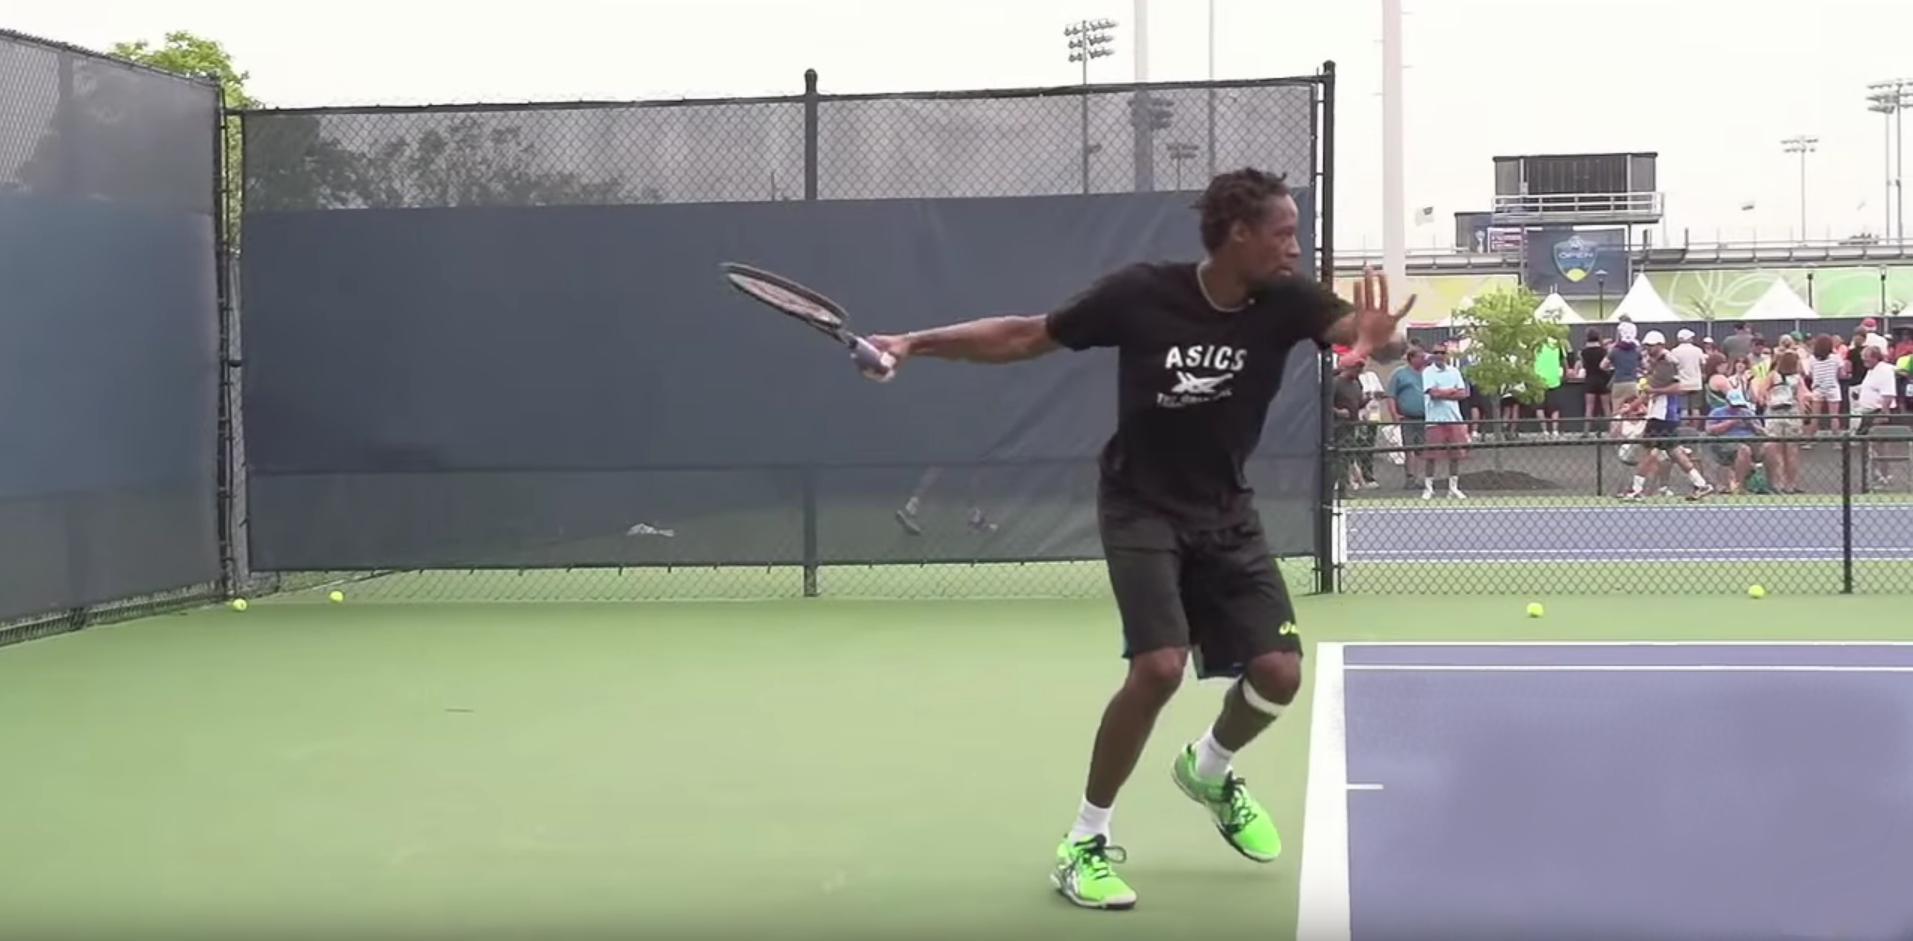 Gael Monfils renvoie la balle de tennis